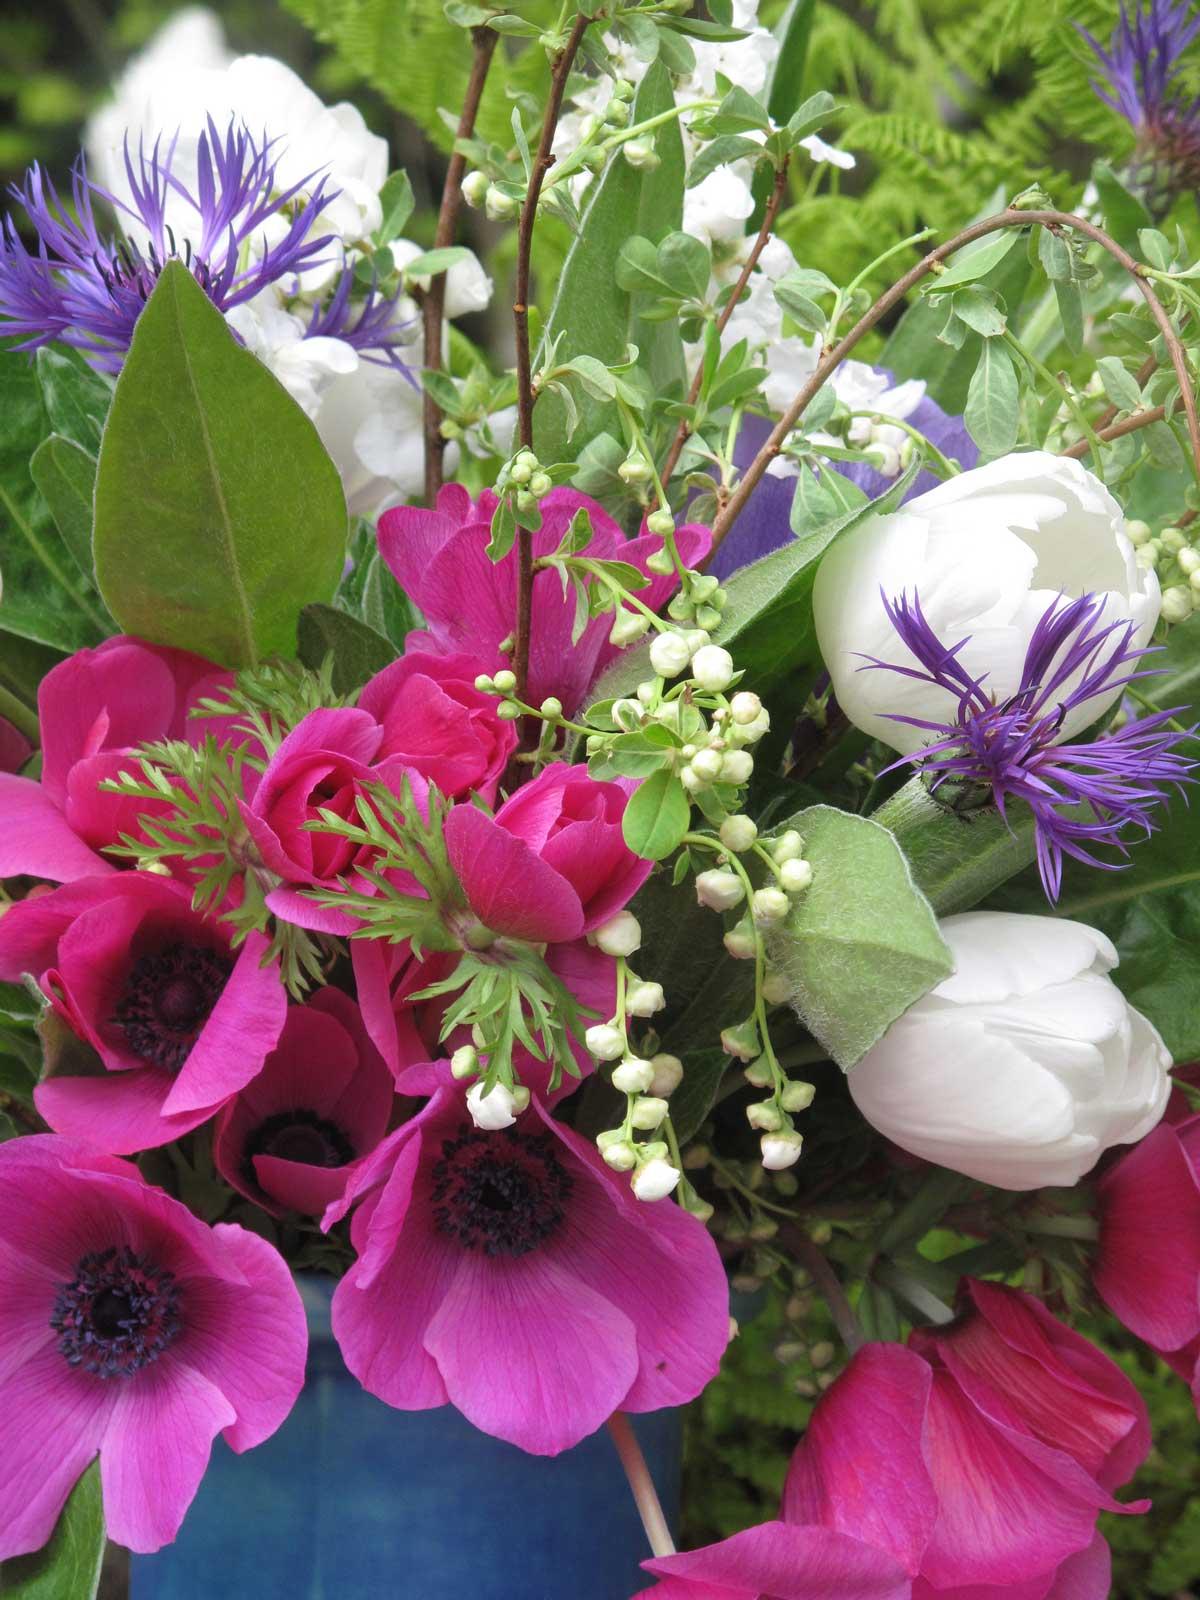 anemone-arrangement-D-Prinzing.jpg